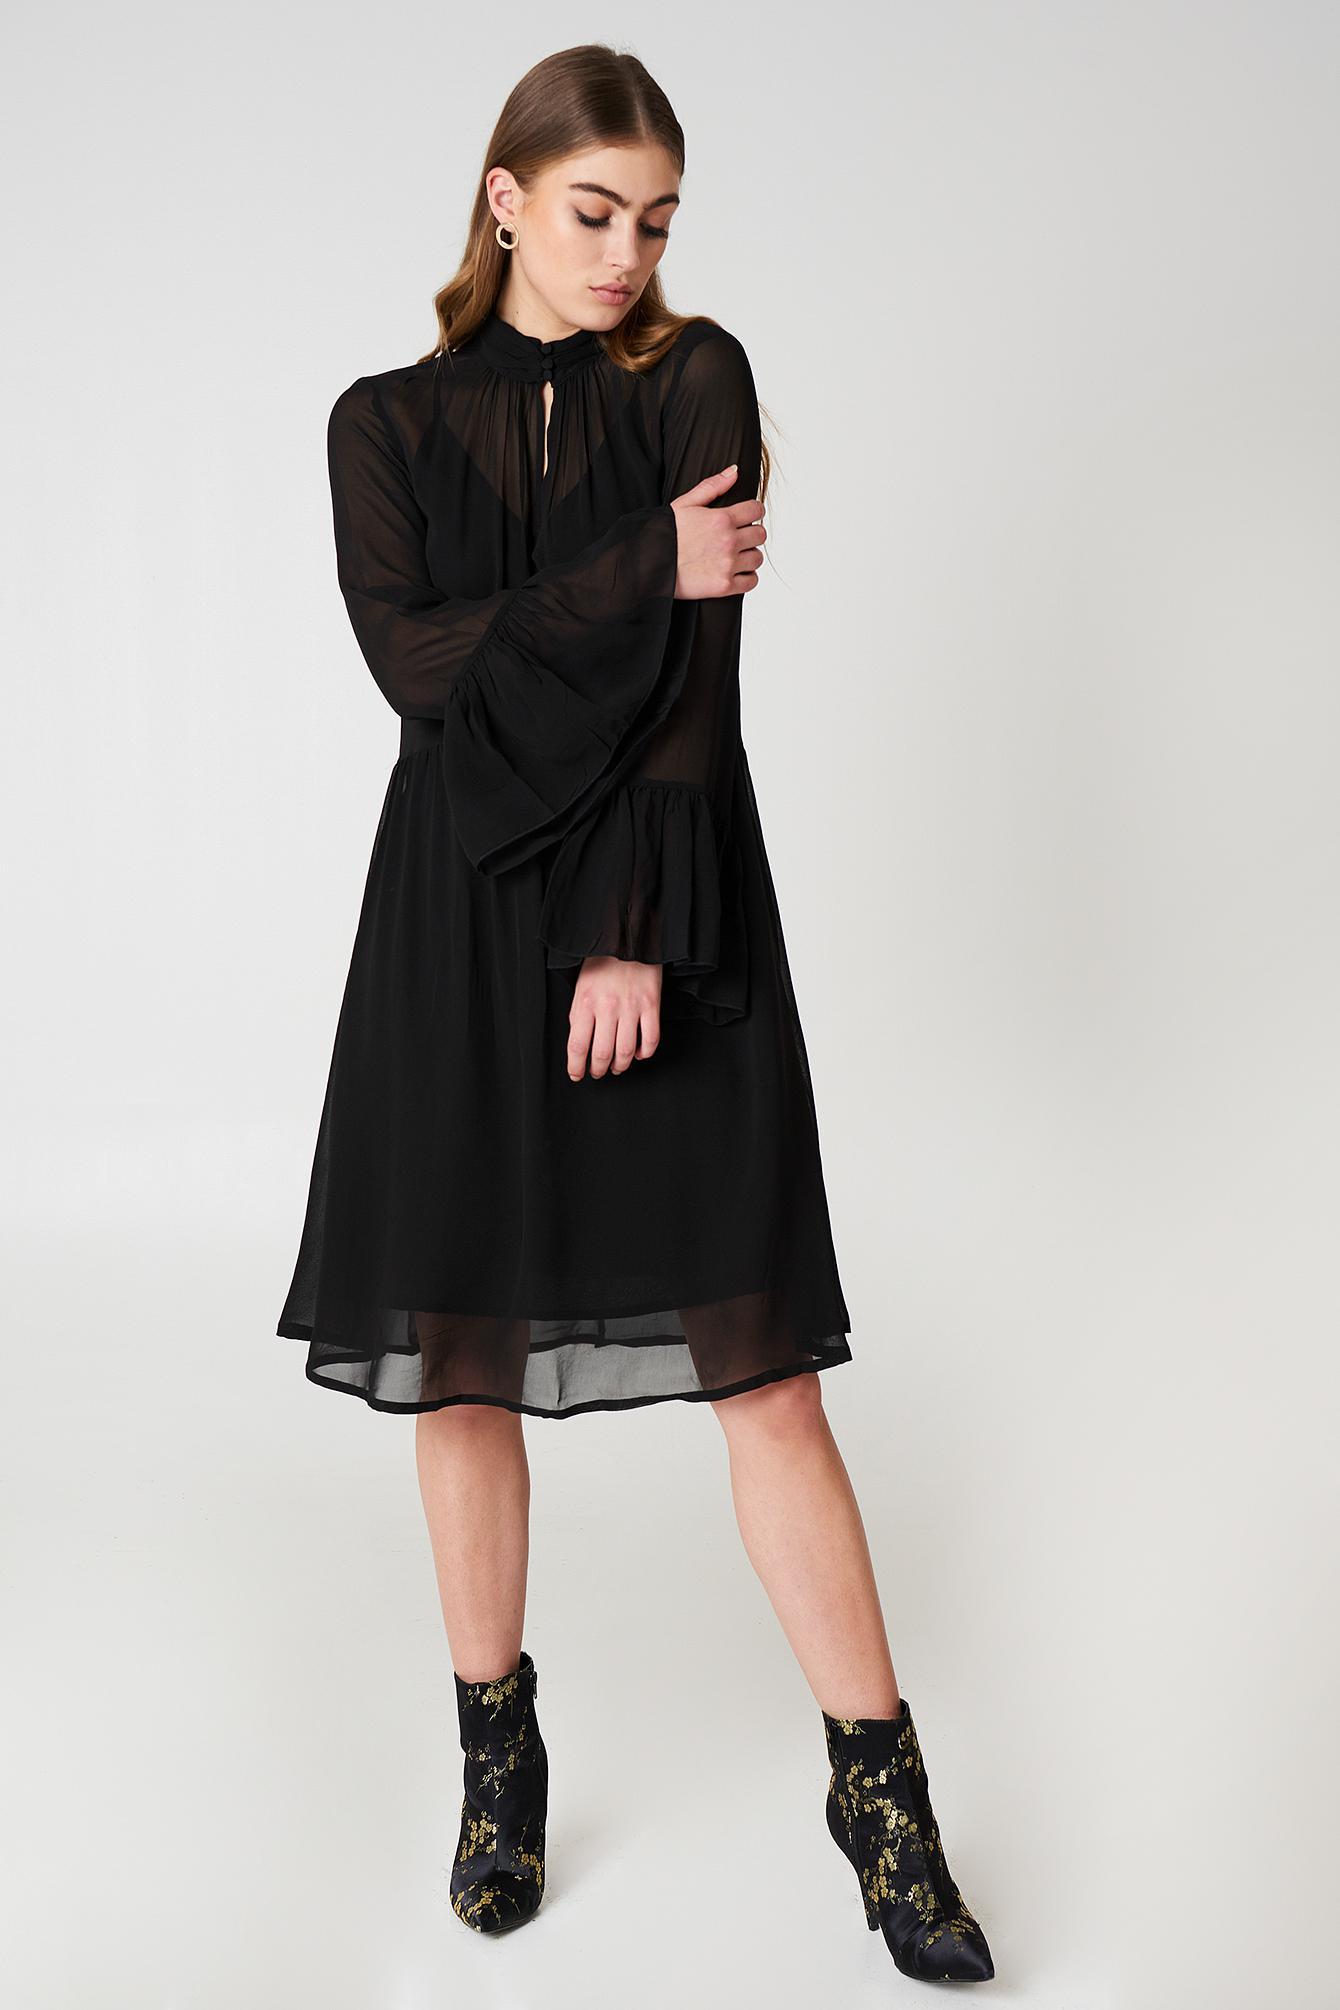 Womens Baxtor Dress Gestuz How Much For Sale Perfect Cheap Online Best Seller lwy8jCX